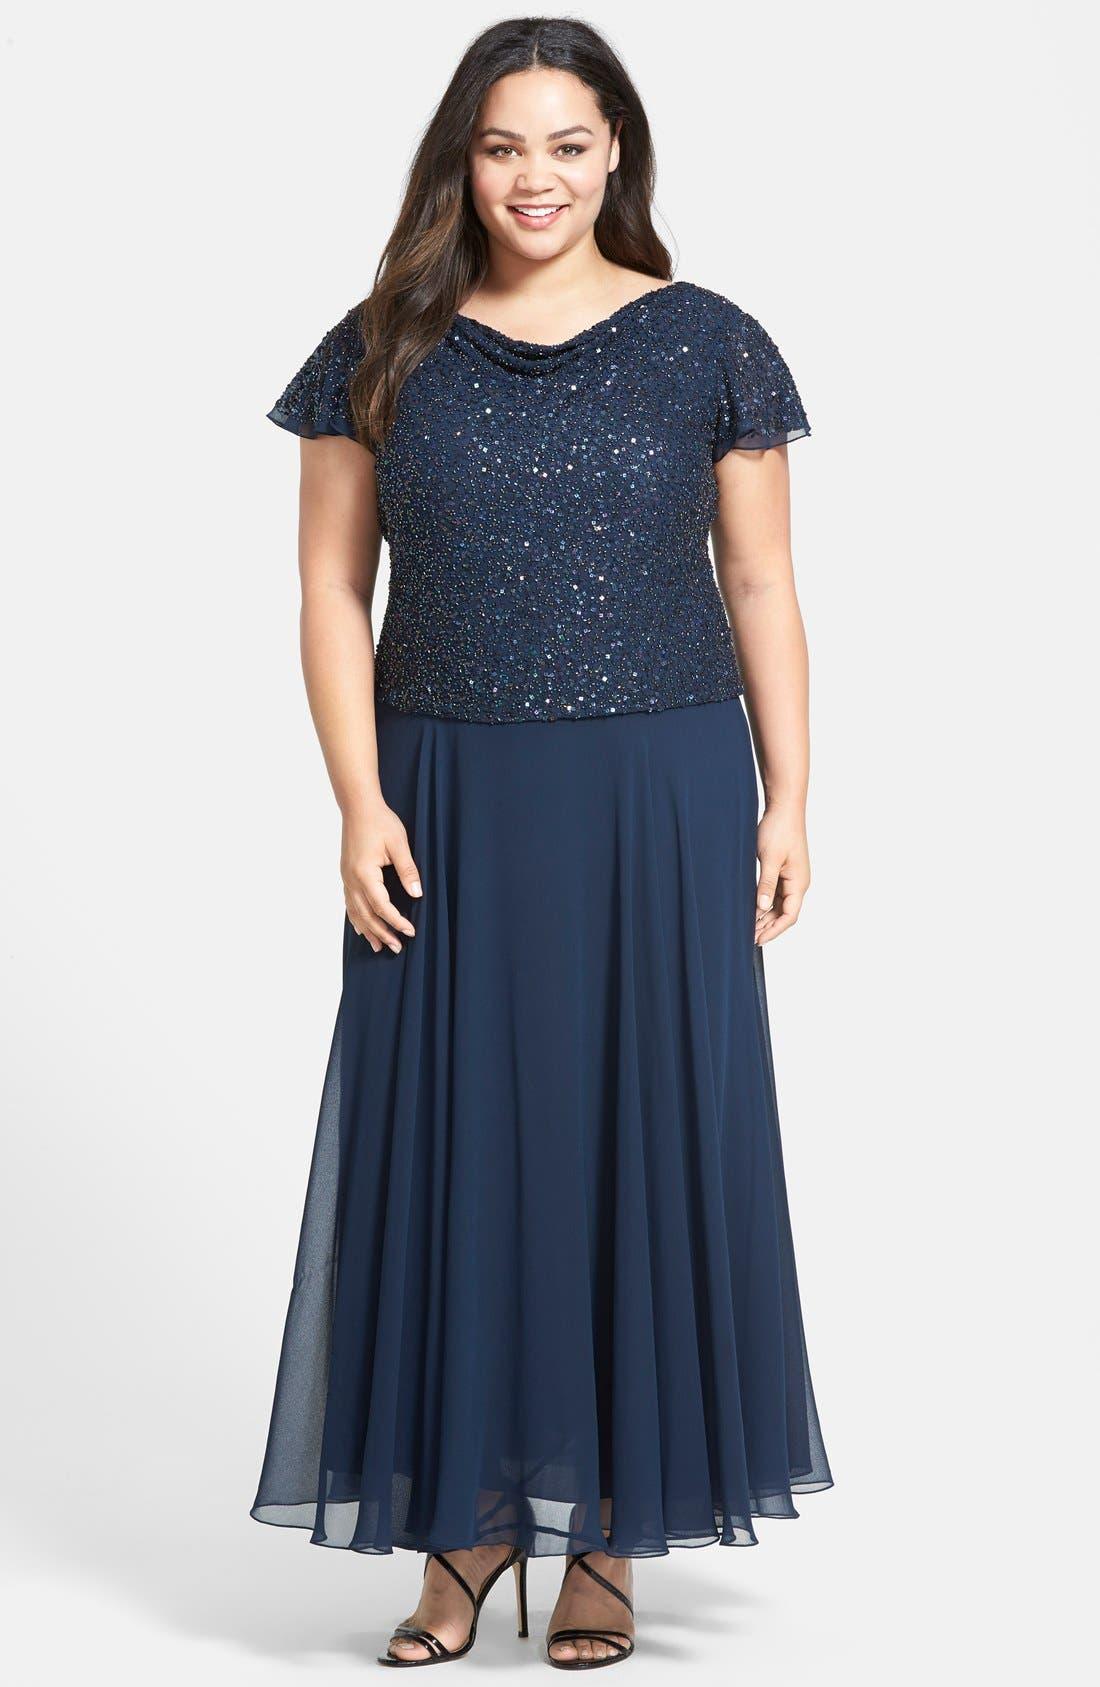 J kara plus sized dresses